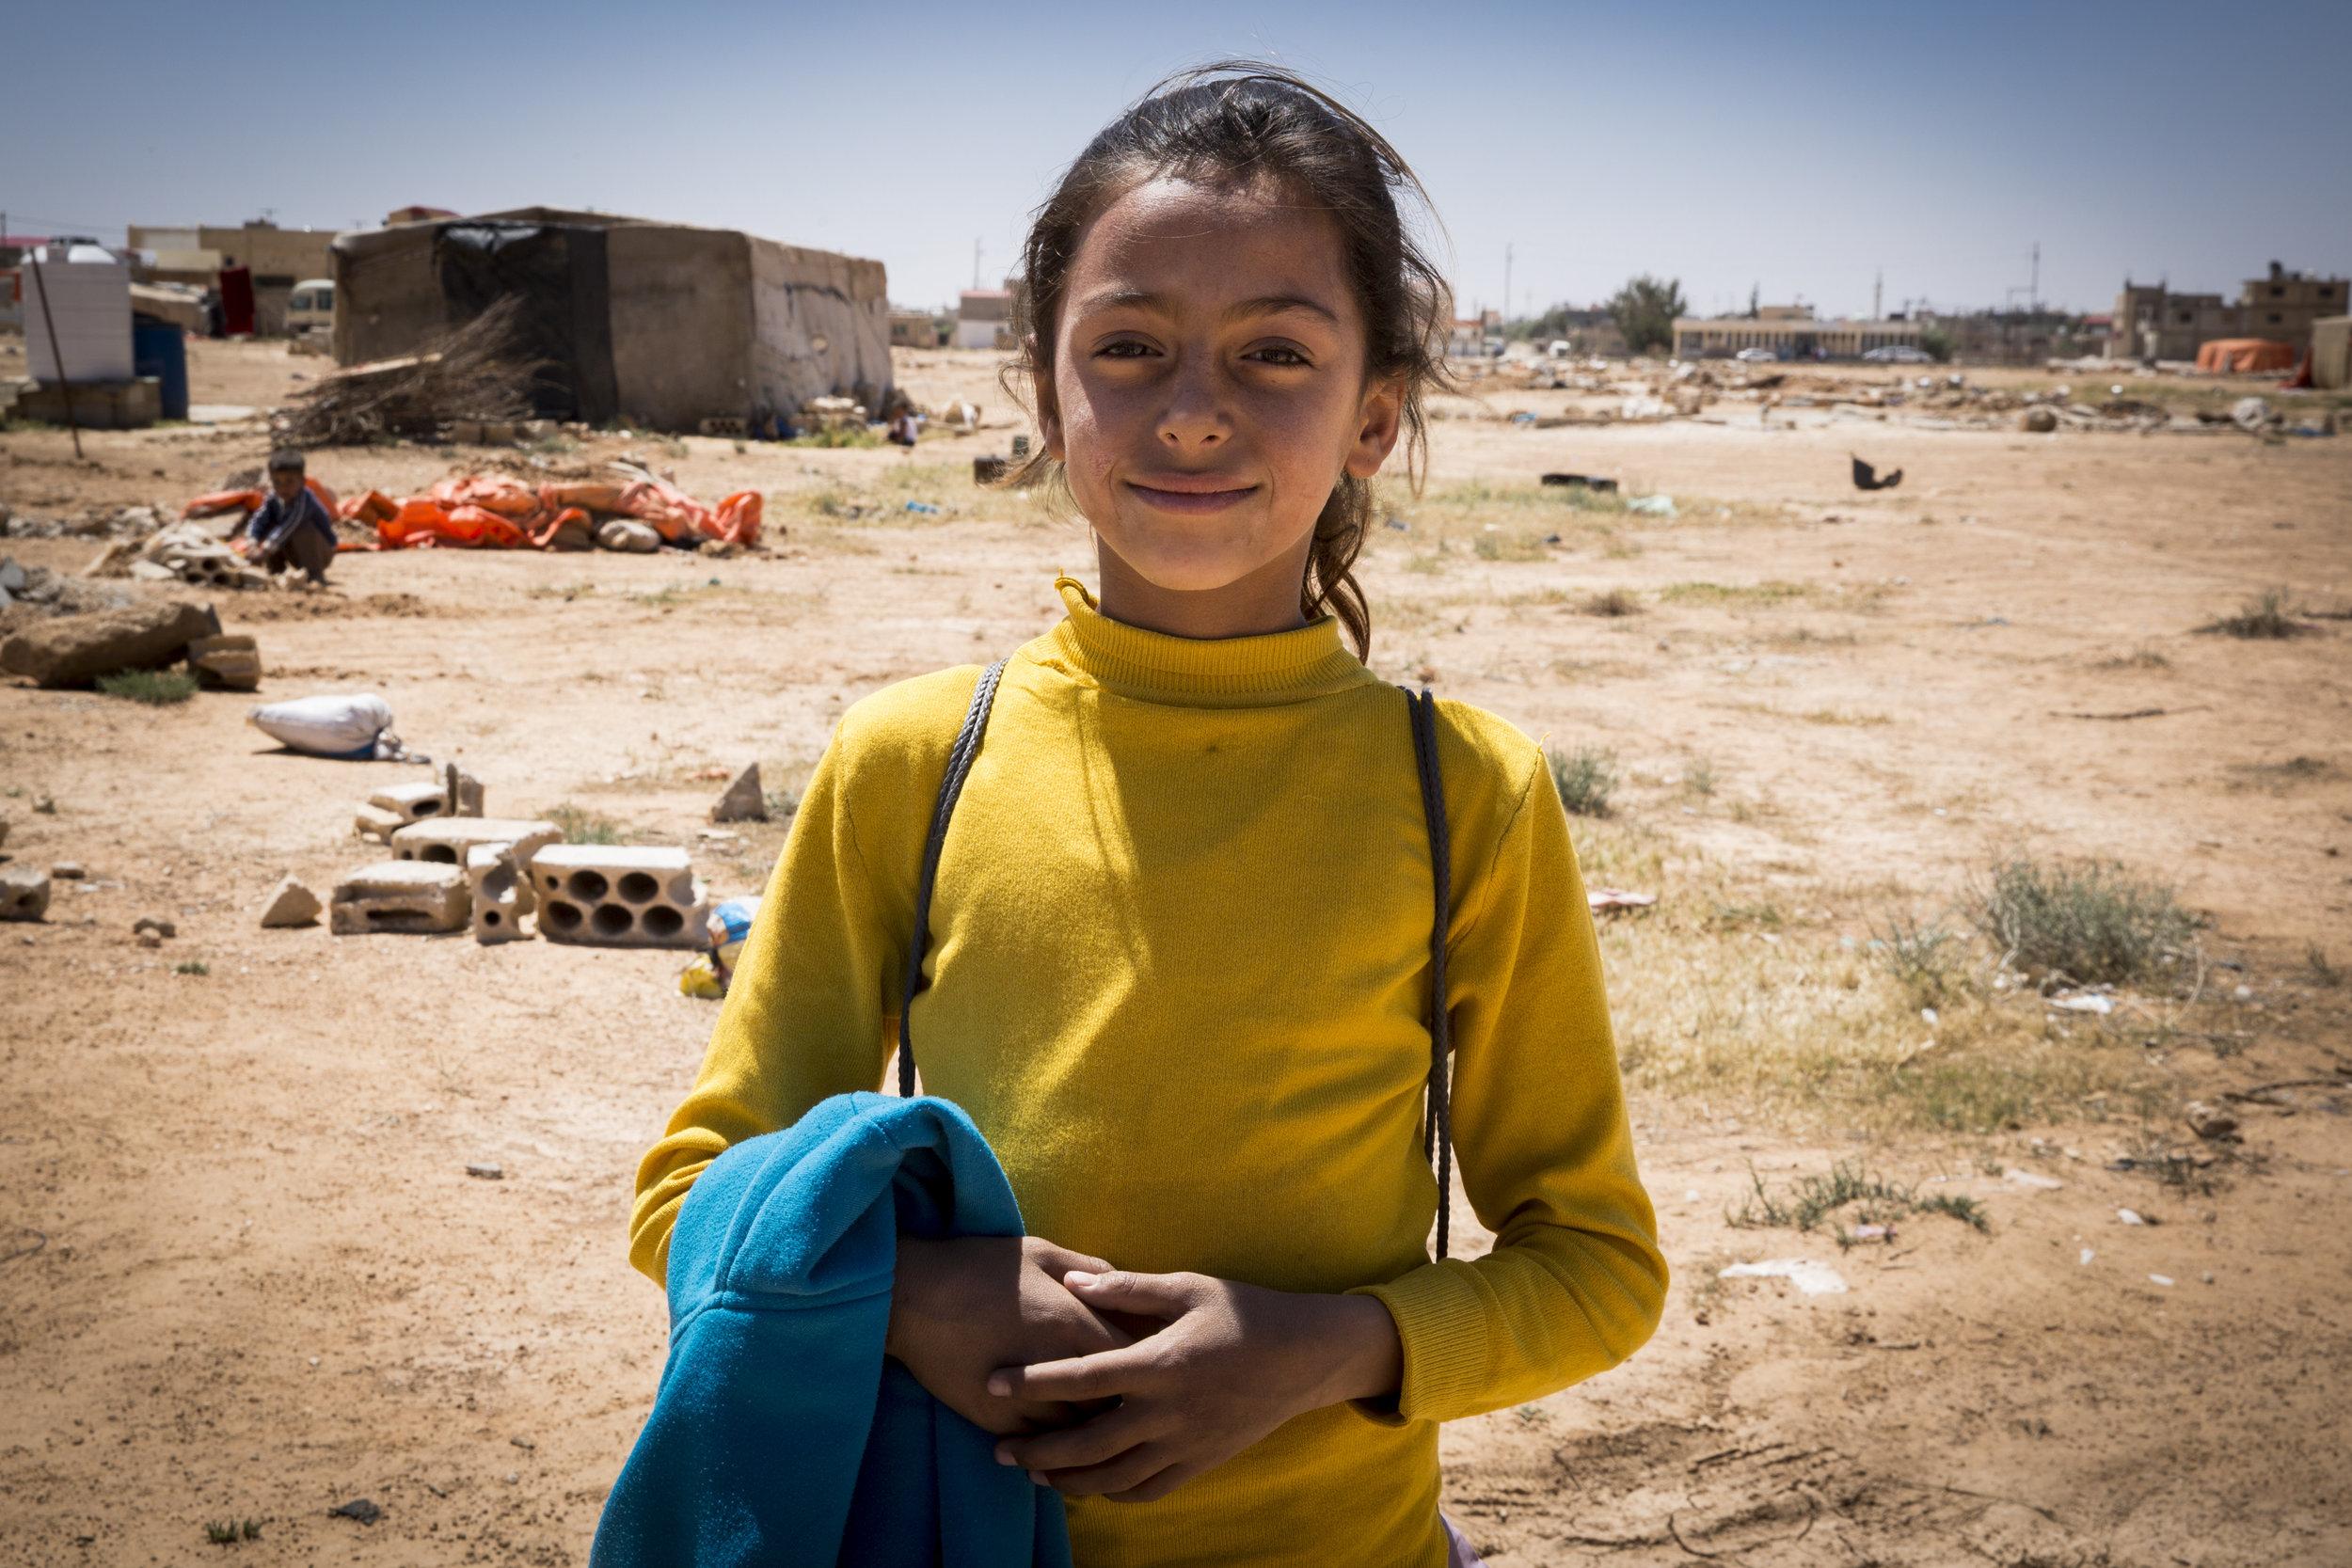 Anal Girl in Al Mafraq